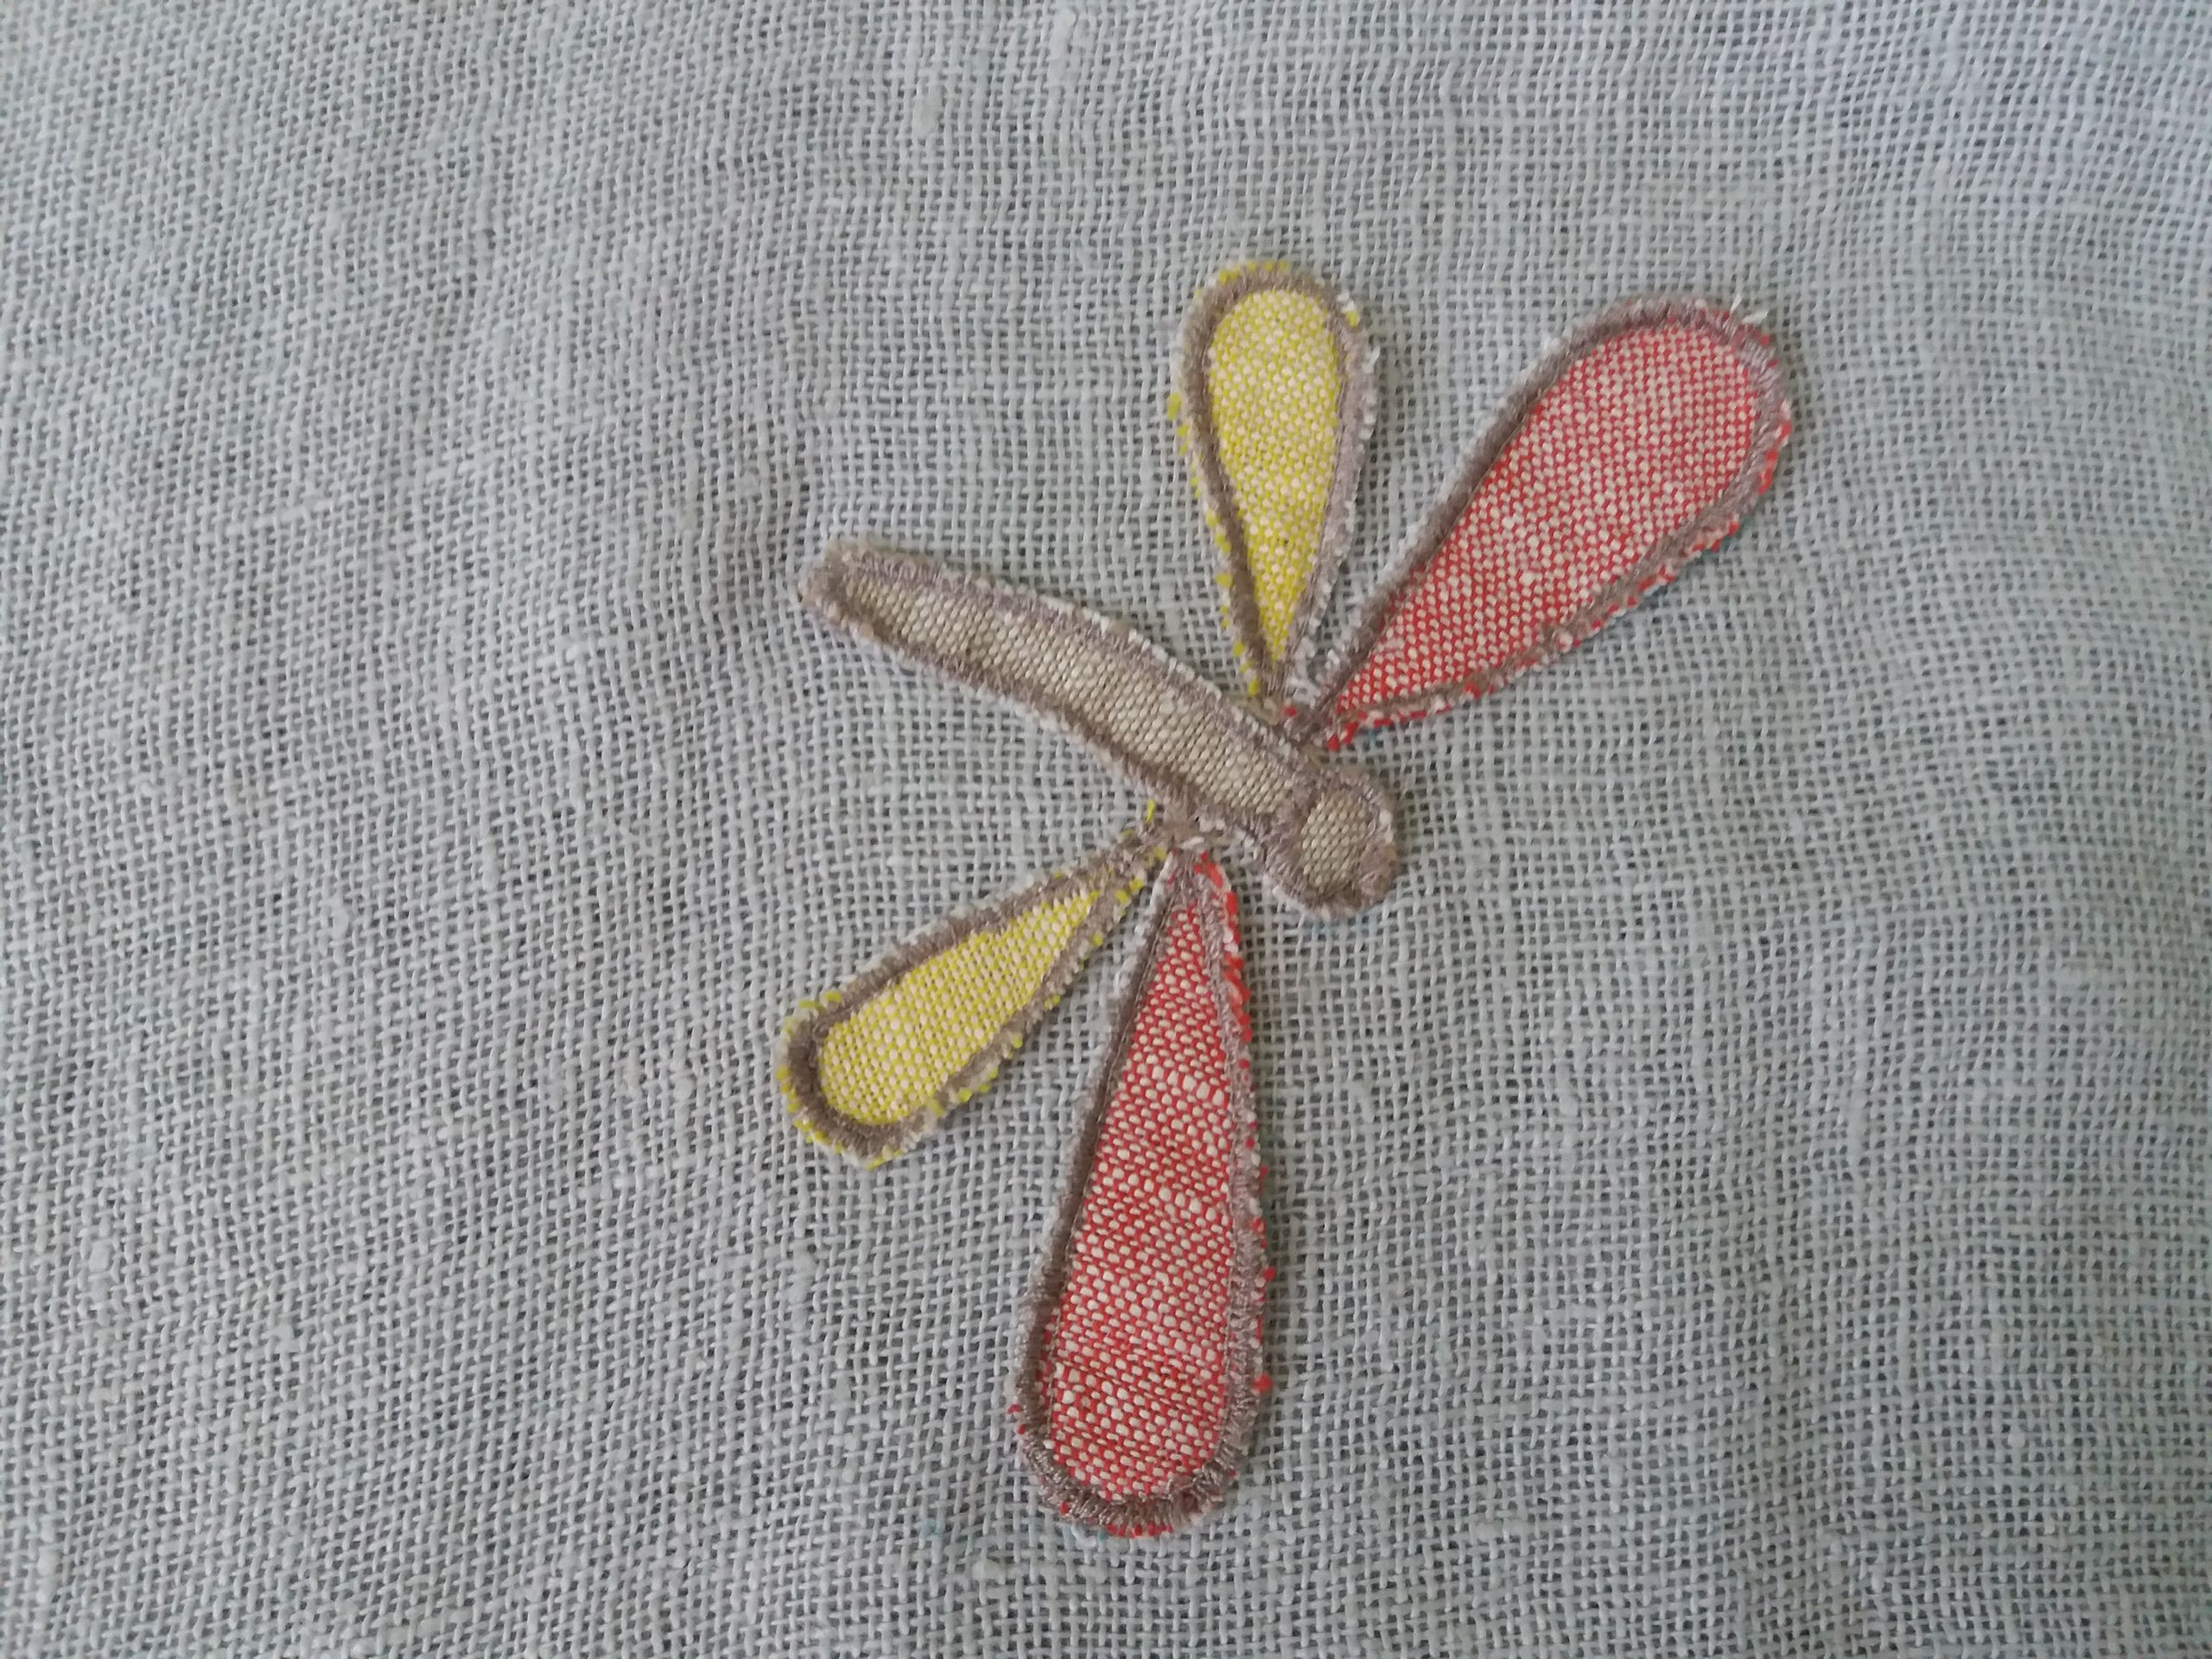 рукоделие одежда вышивка аппликация ручная любимаяблузка работаназаказ